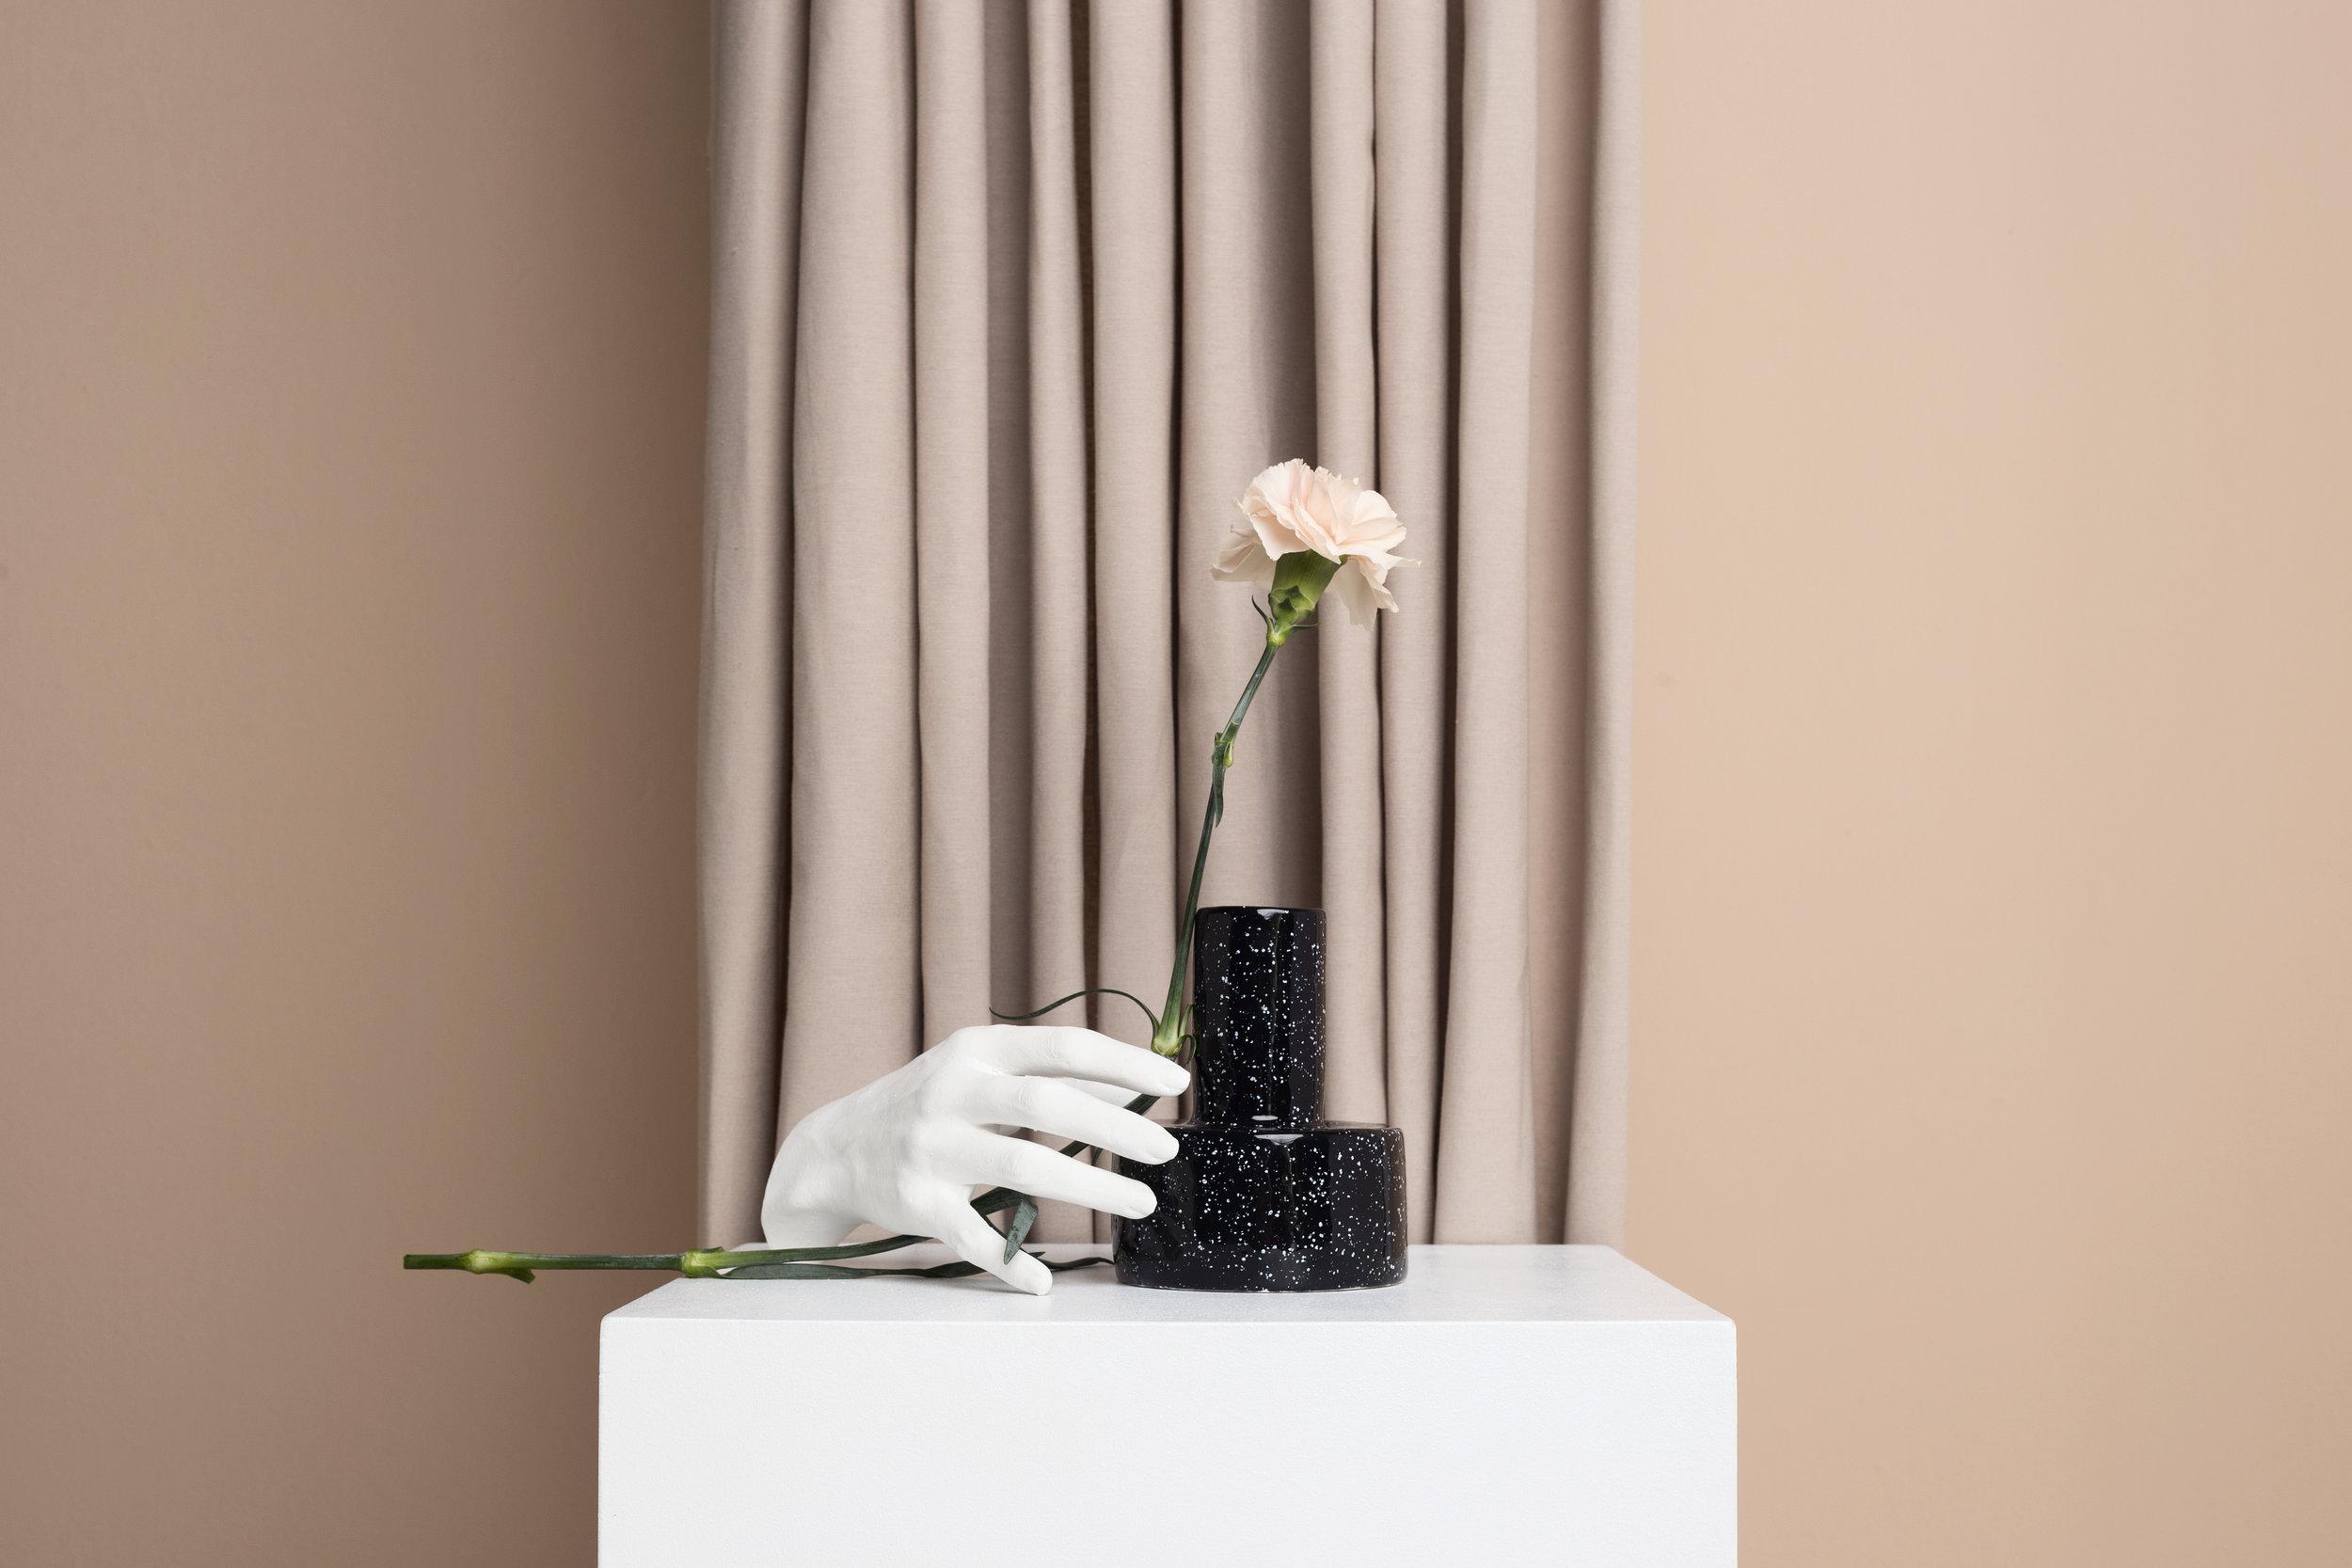 Column + Plaster Hand  Set: La Cueva Studio & Marcela Luna  Photo: Erika Anes